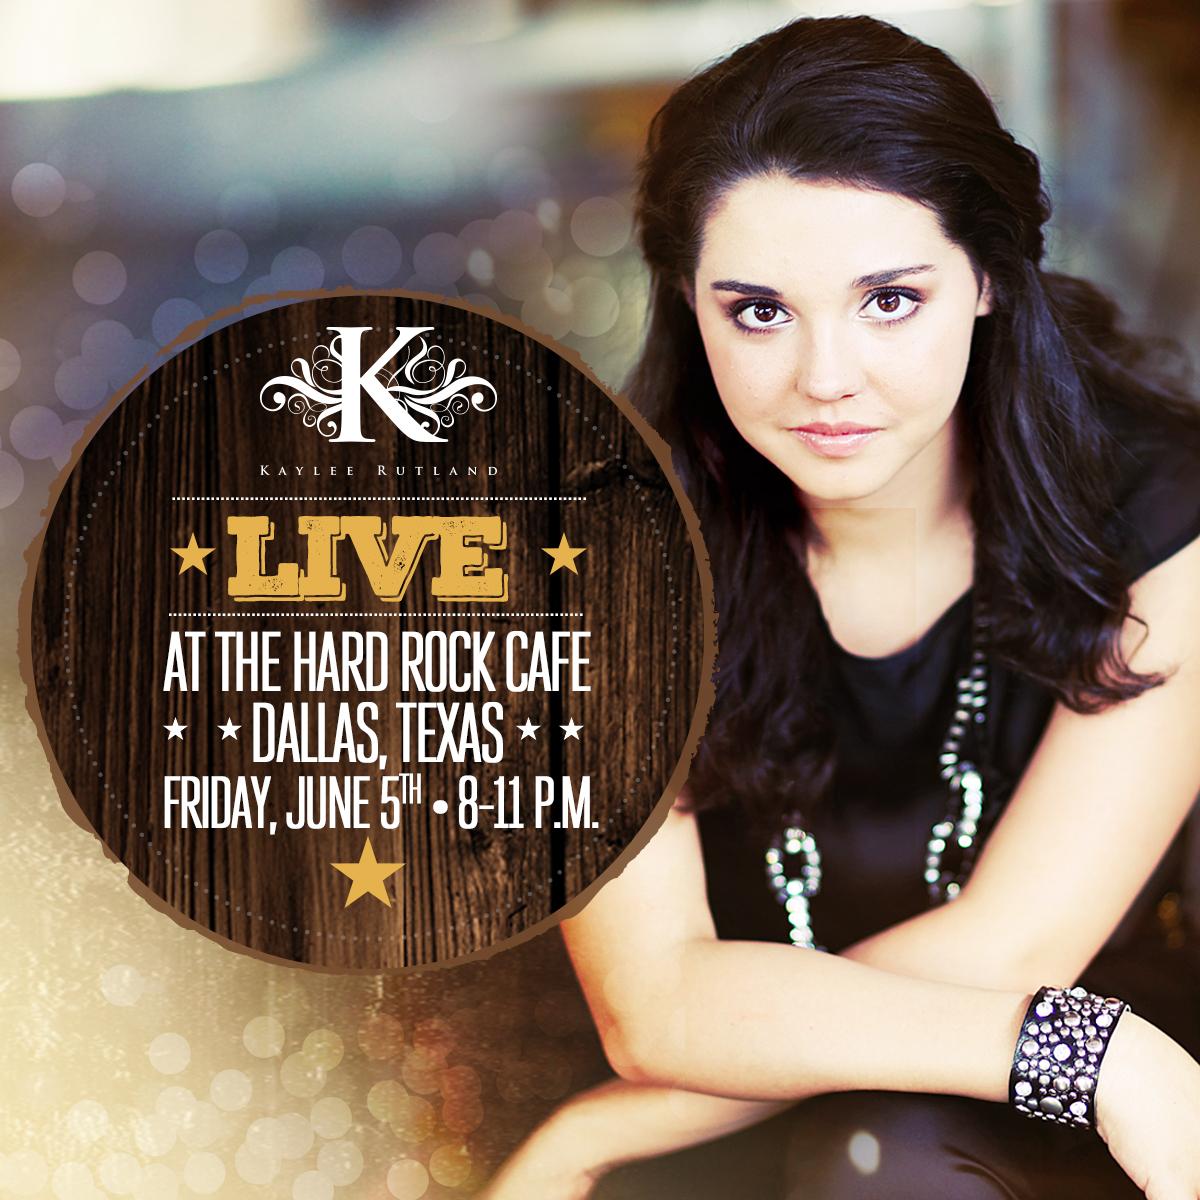 Kaylee Rutland Live in Dallas at the Hard Rock Cafe Friday, June 5, 2015